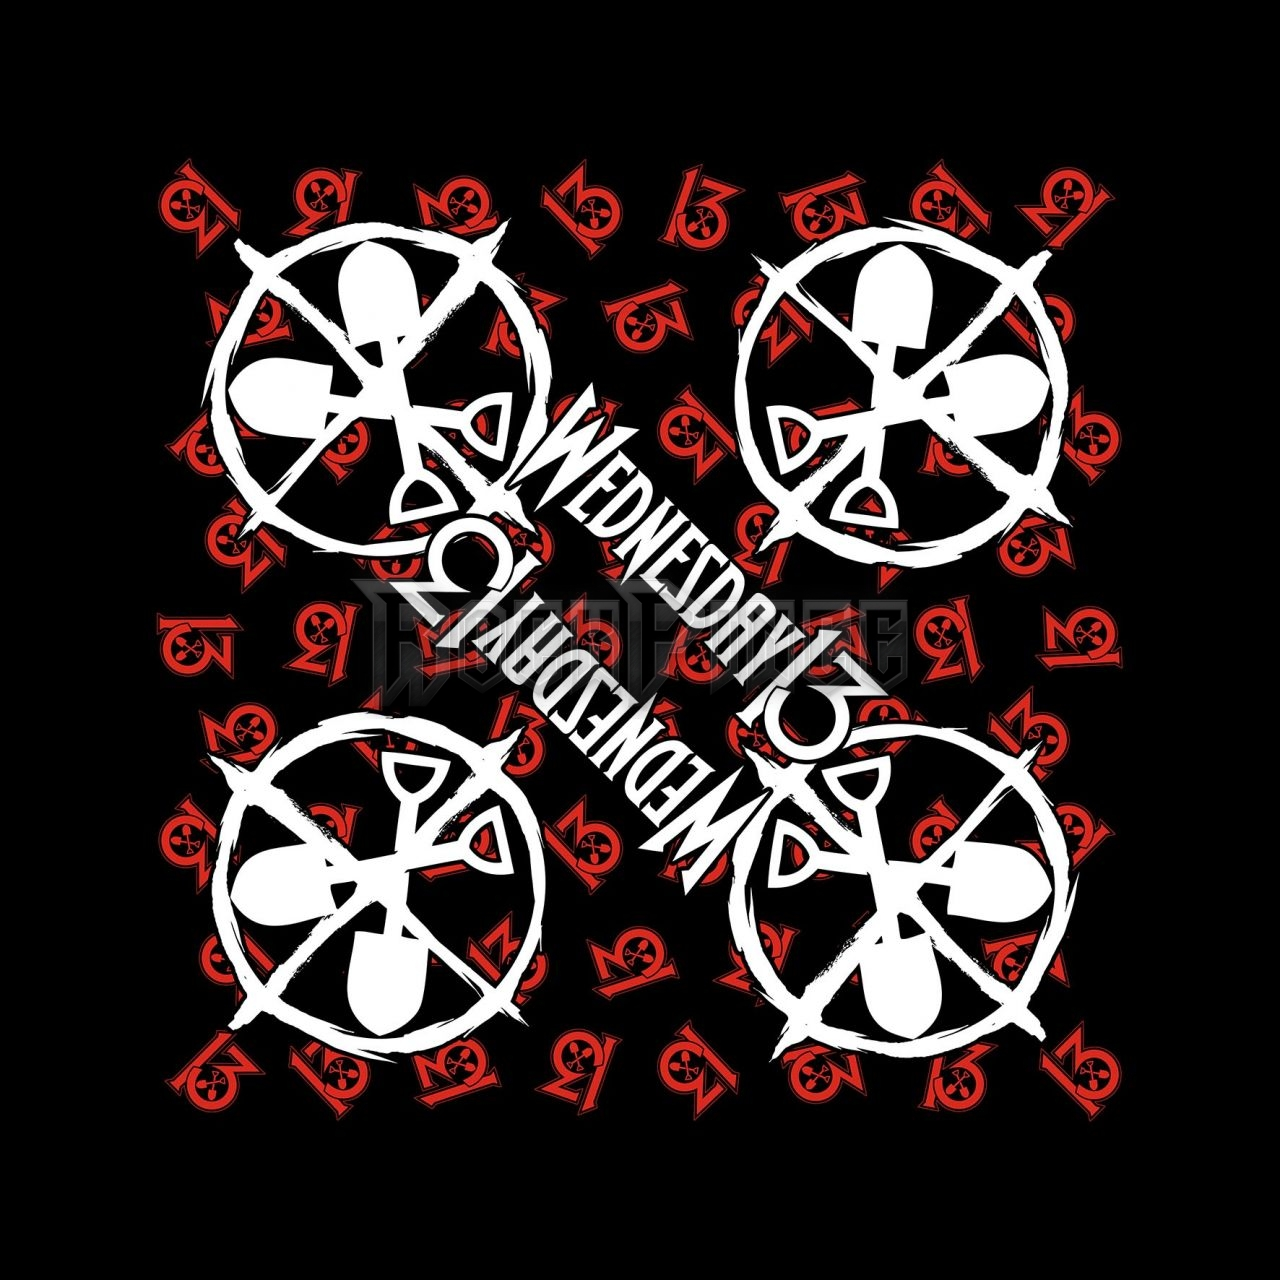 Wednesday 13 'Logo Shovels' Bandana - B073